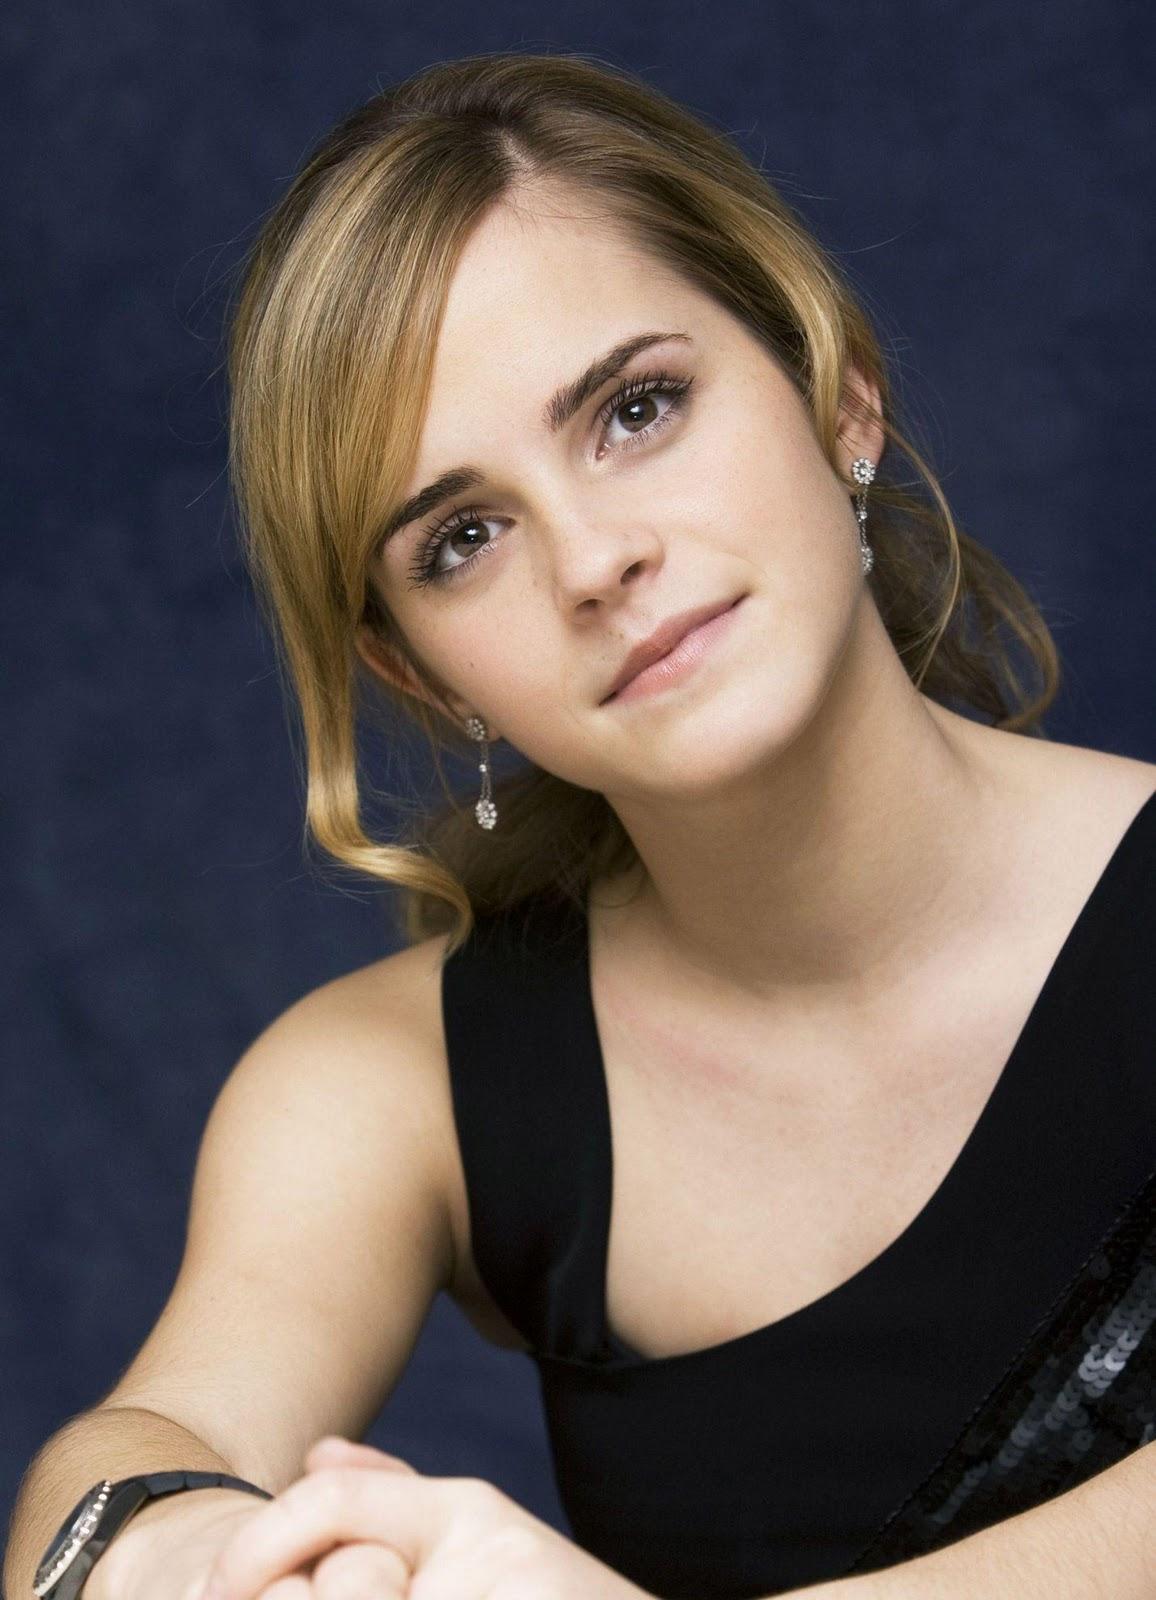 http://2.bp.blogspot.com/-1RI7GmfFJwc/TxQtk6UzDhI/AAAAAAAAAMo/7AUD3IAdtQg/s1600/Emma_Watson.jpg